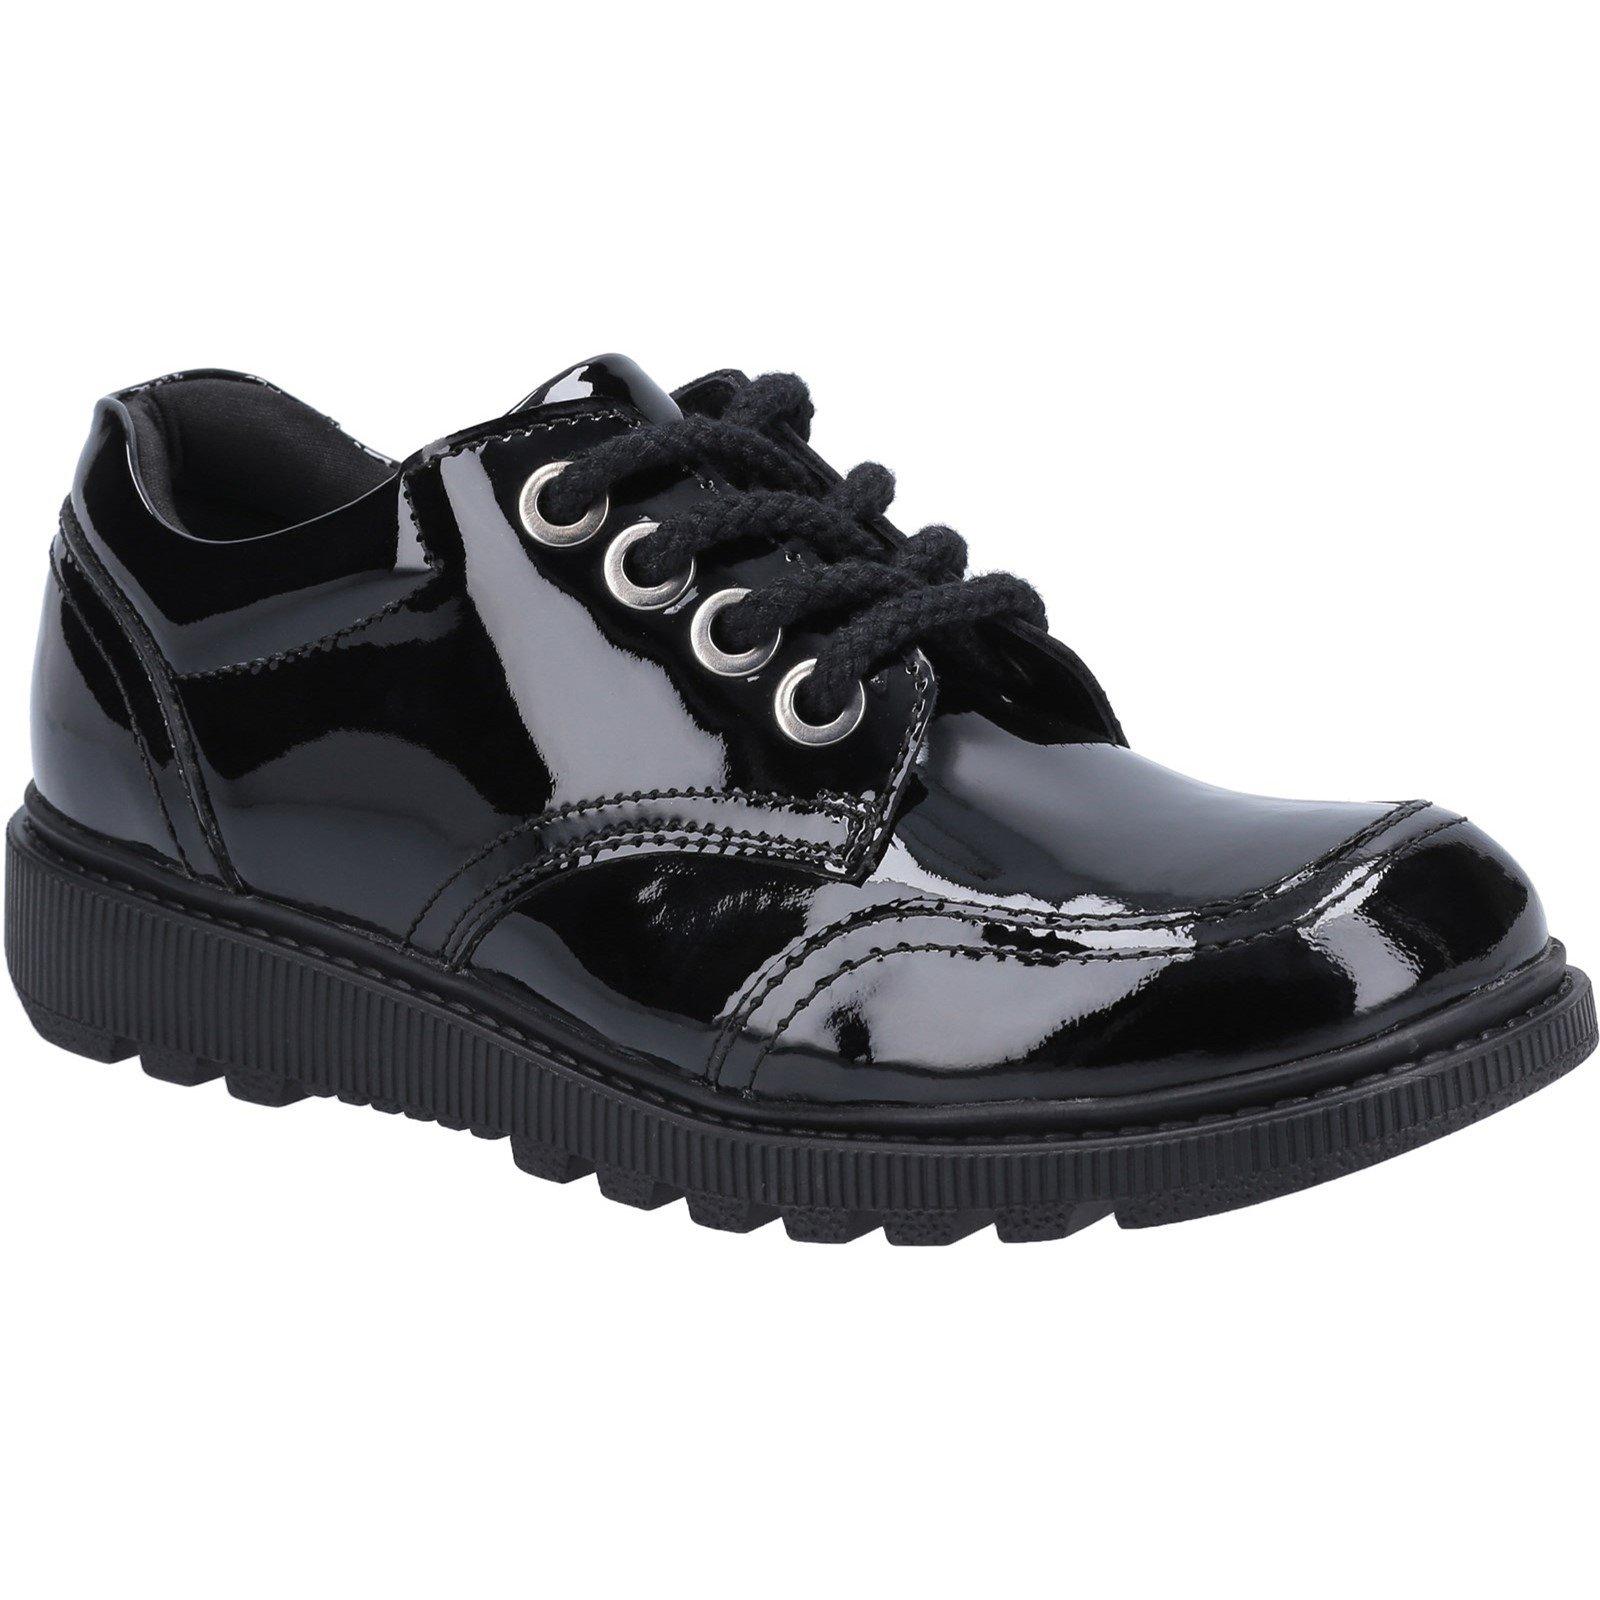 Hush Puppies Kid's Kiera Senior Patent School Shoe Black 30824 - Patent Black 3